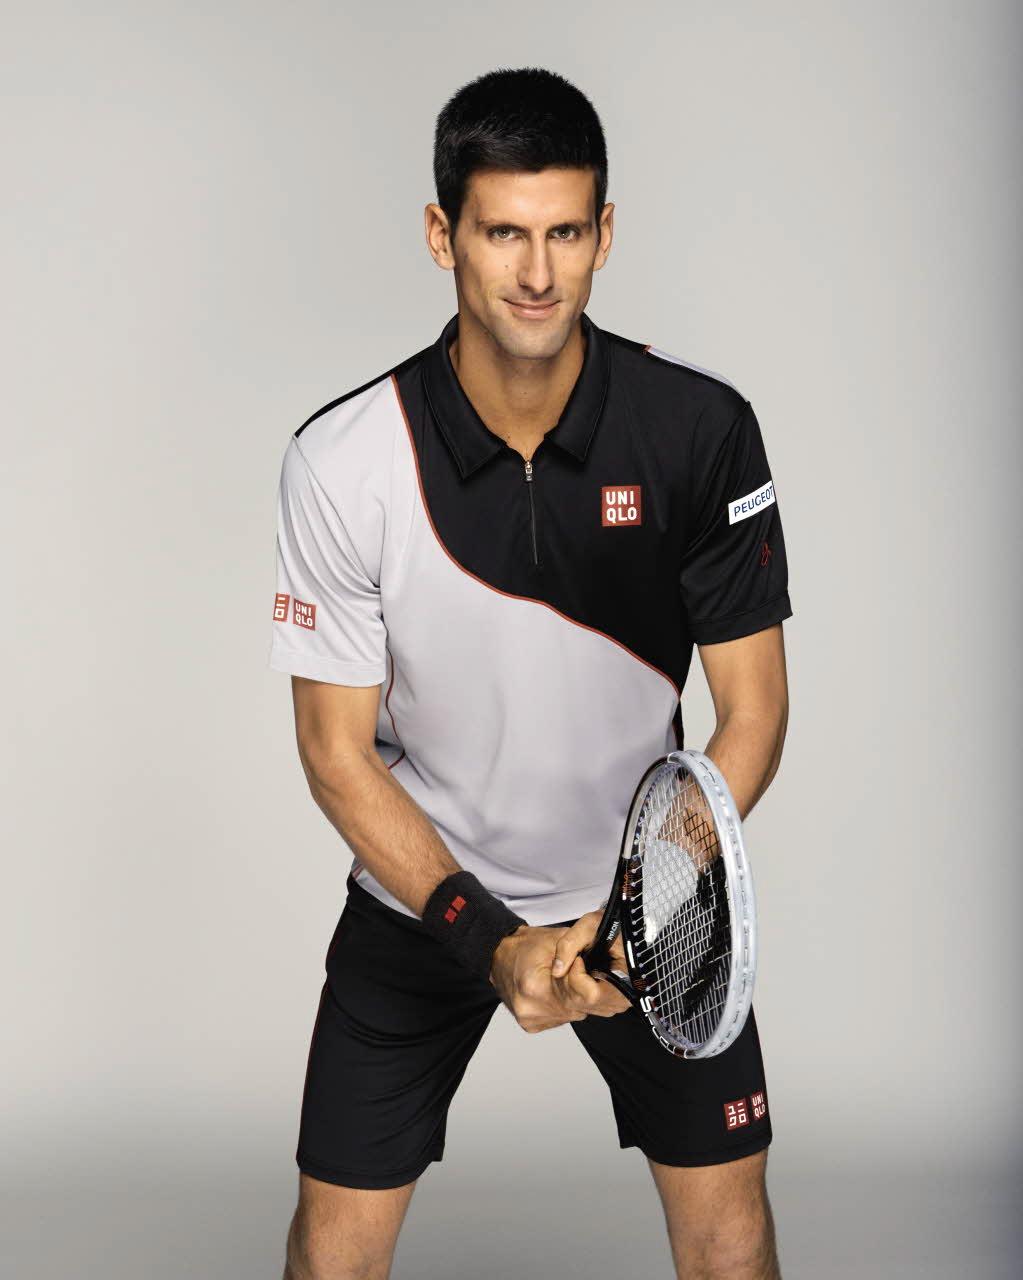 Novak Djokovic 6 High Resolution Wallpaper Wallpaper 1023x1280